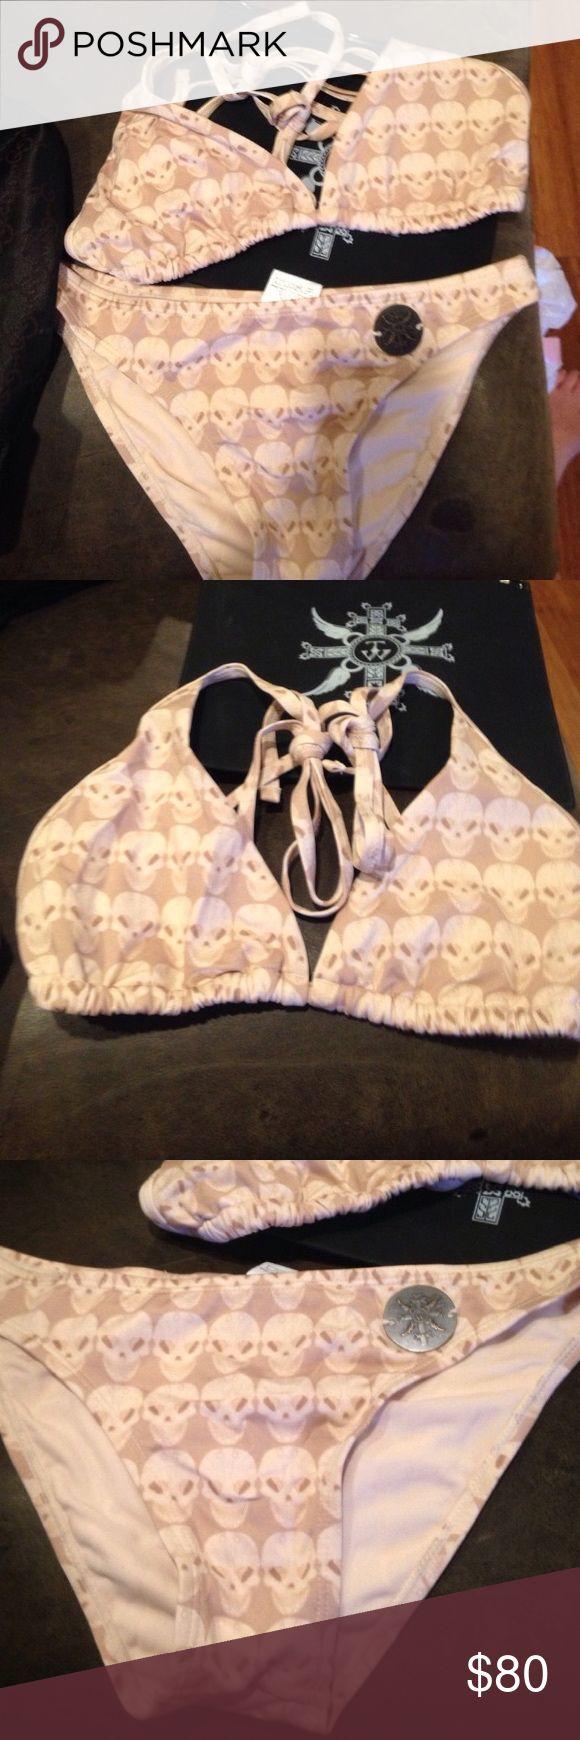 New in water proof bag Thomas Wylde skull bikini New, never worn, comes in Waterloo pouch, Paula Thomas for Thomas Wylde size large thomas wylde Swim Bikinis